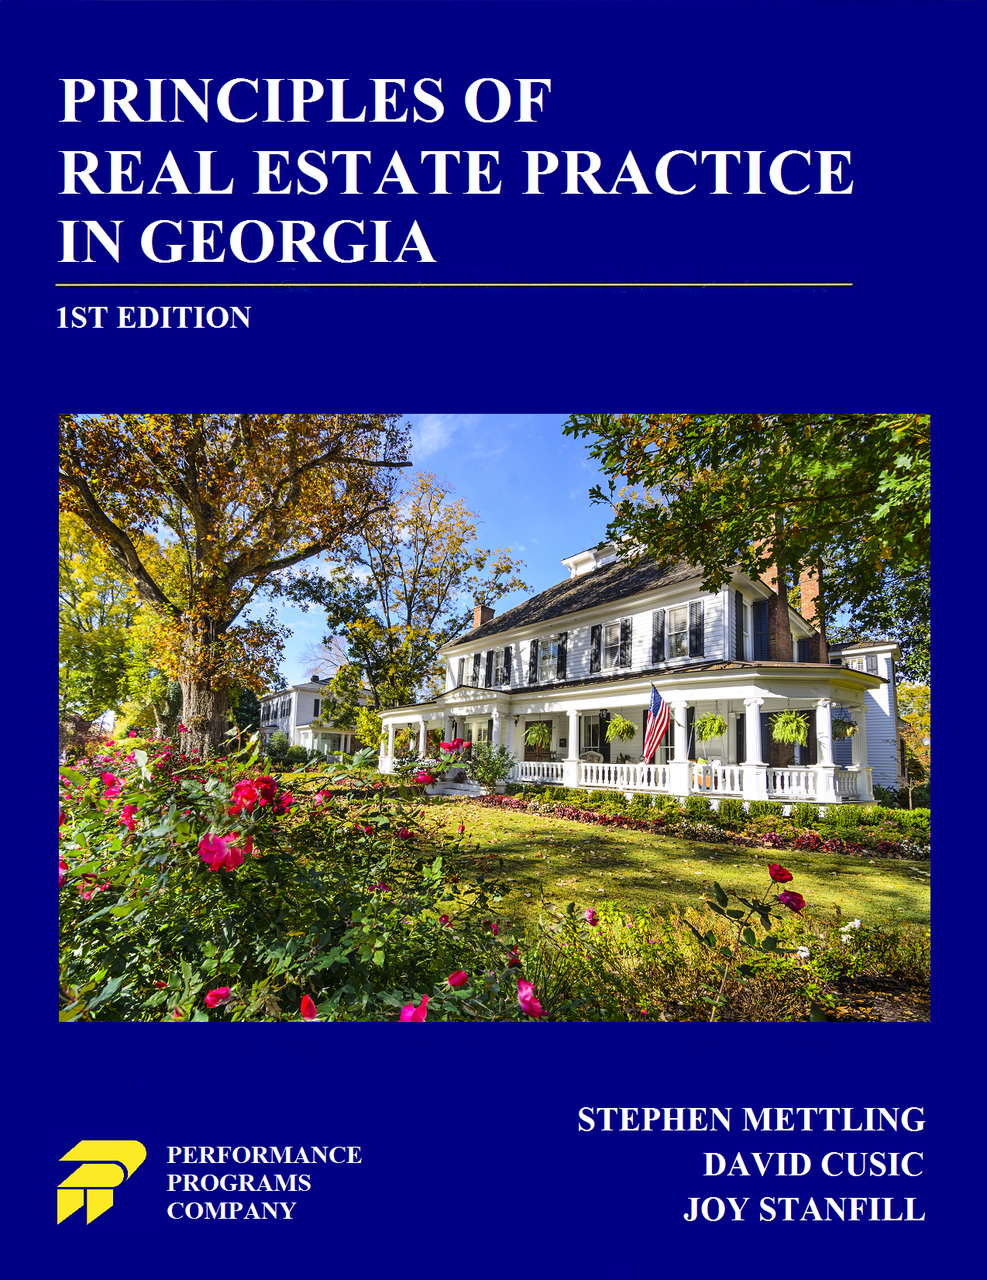 Principles of Real Estate Practice In Georgia - 1st Edition - PDF Version